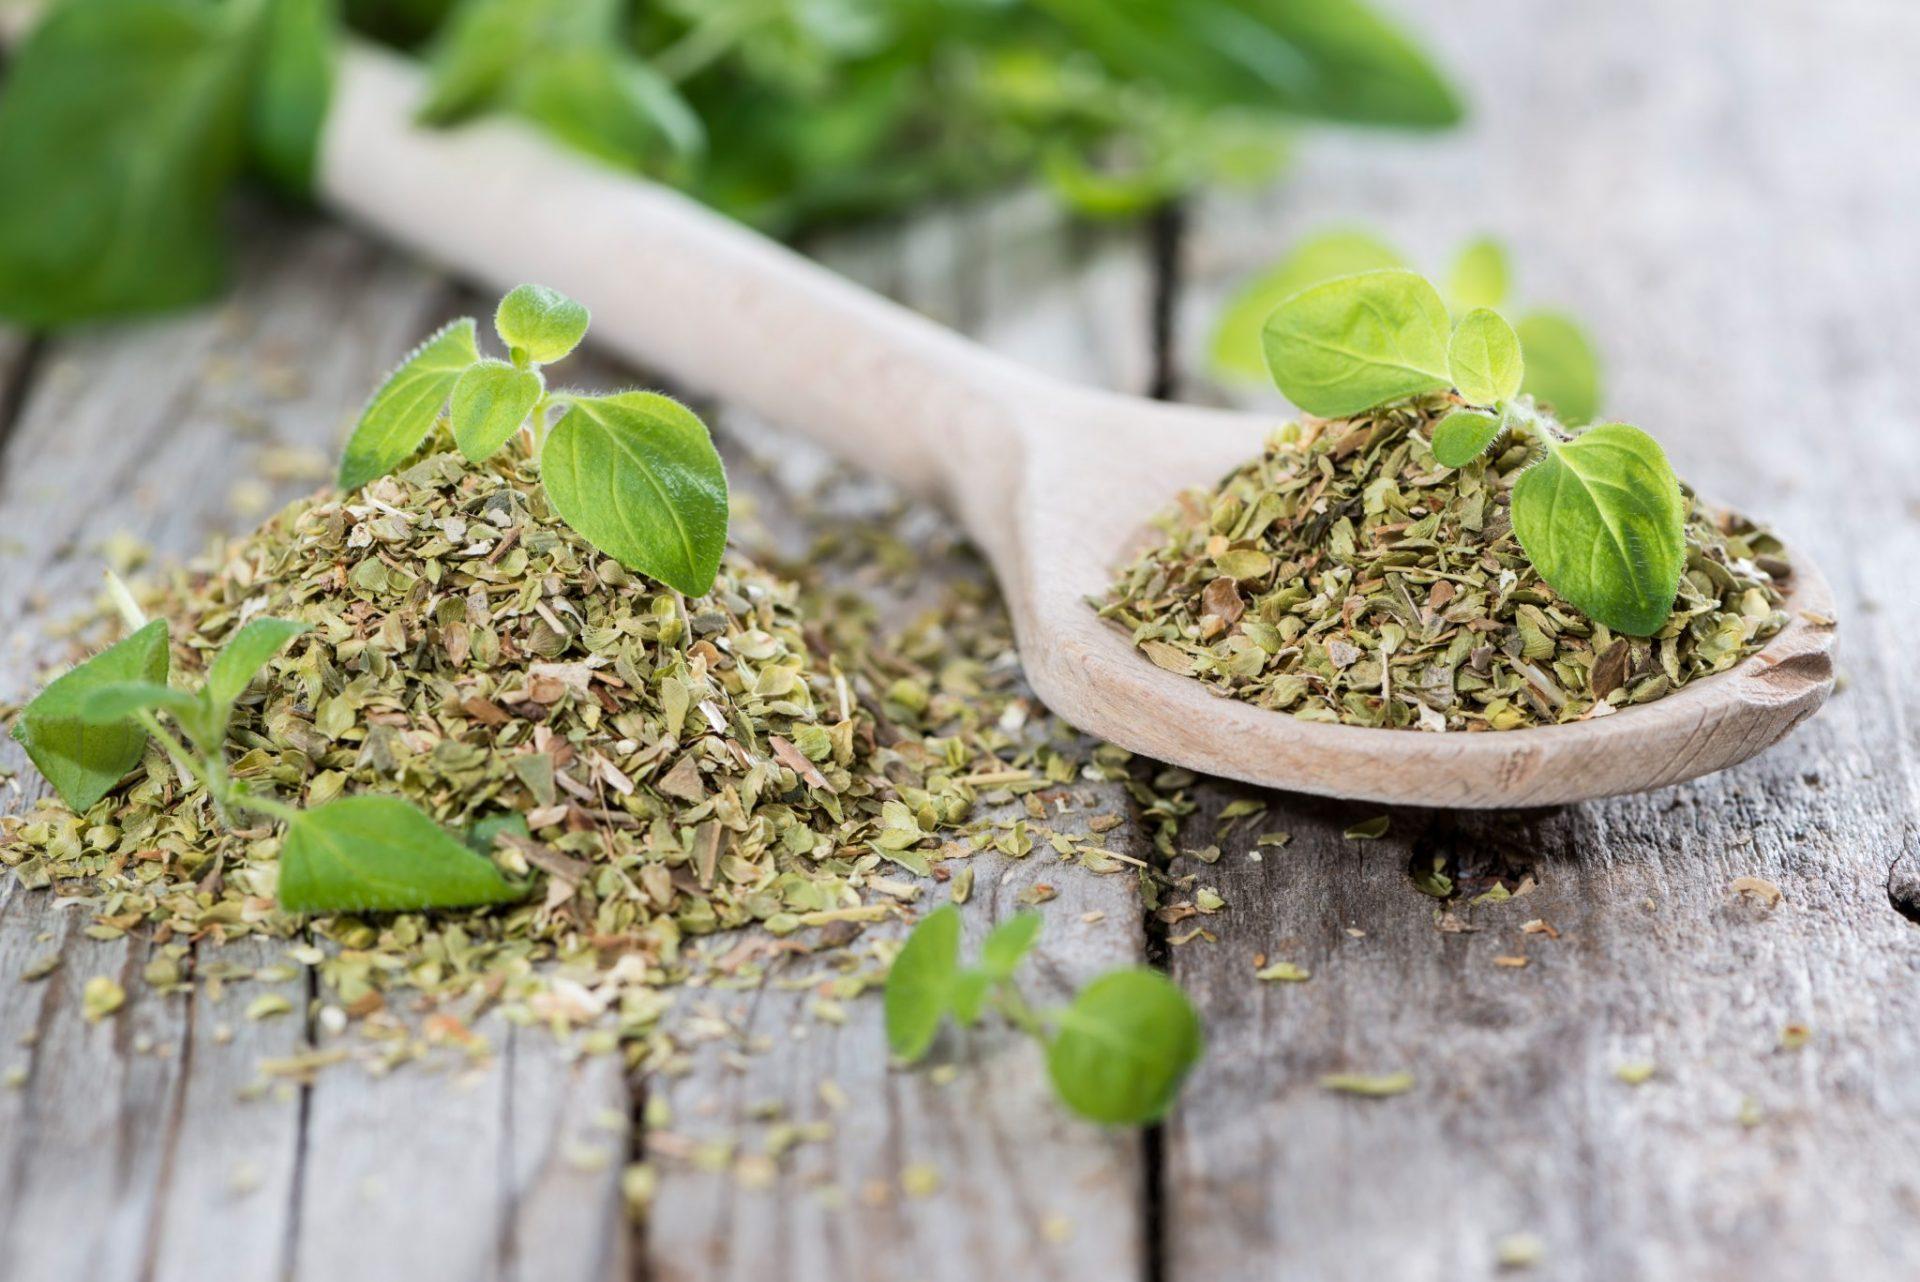 spoon of herbs